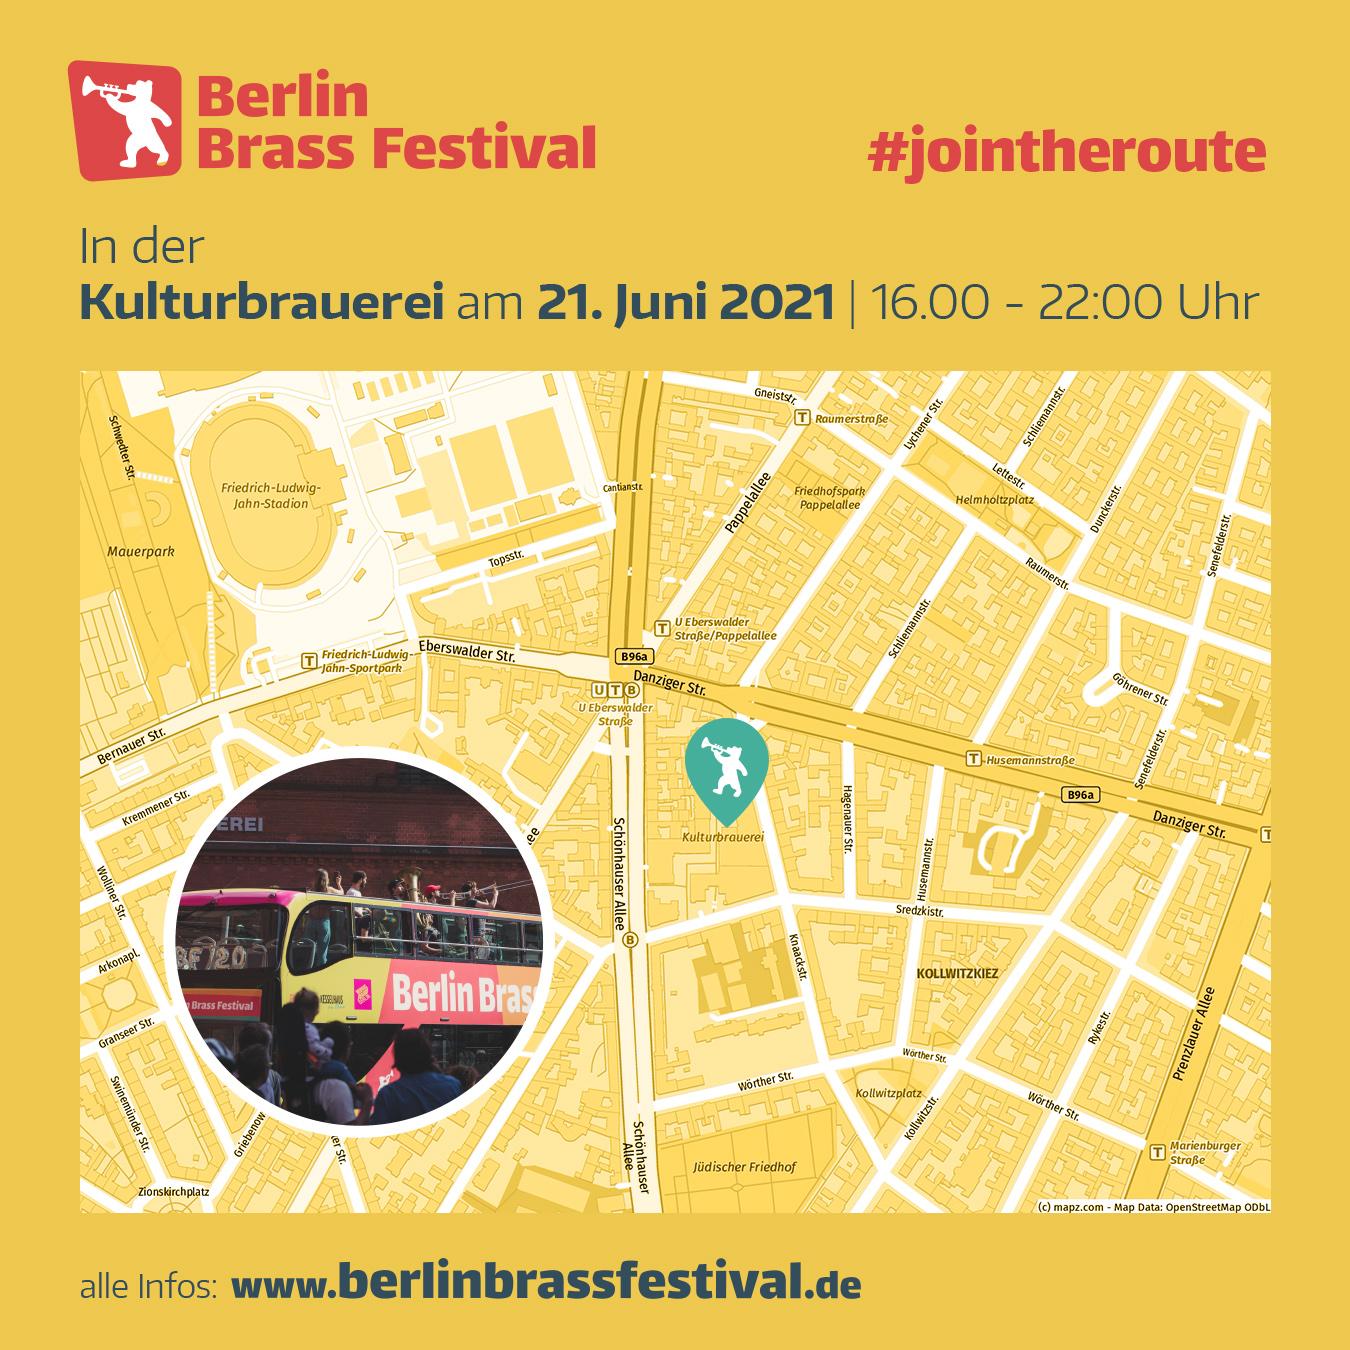 Berlin Brass Festival 2021Kulturbrauerei